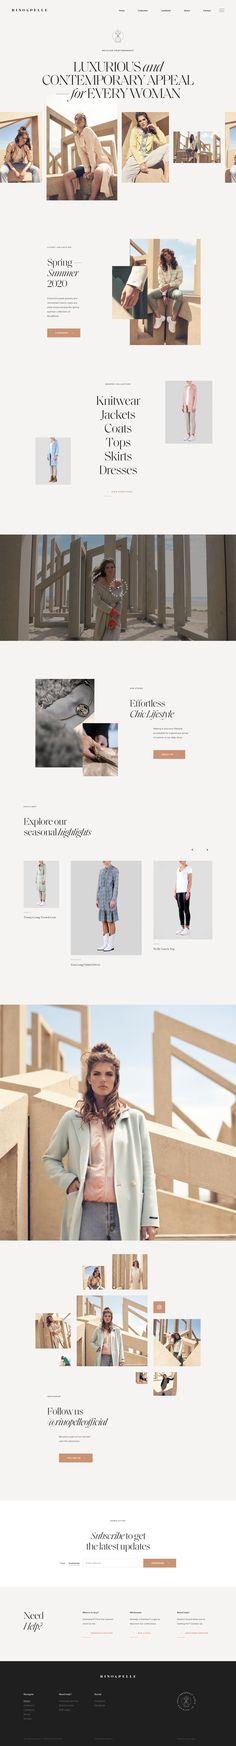 Rino & Pelle landing page design inspiration - Lapa Ninja Web Design Trends, Best Web Design, Ad Design, Layout Design, Graphic Design, Website Design Inspiration, Beautiful Website Design, Landing Page Inspiration, Website Layout